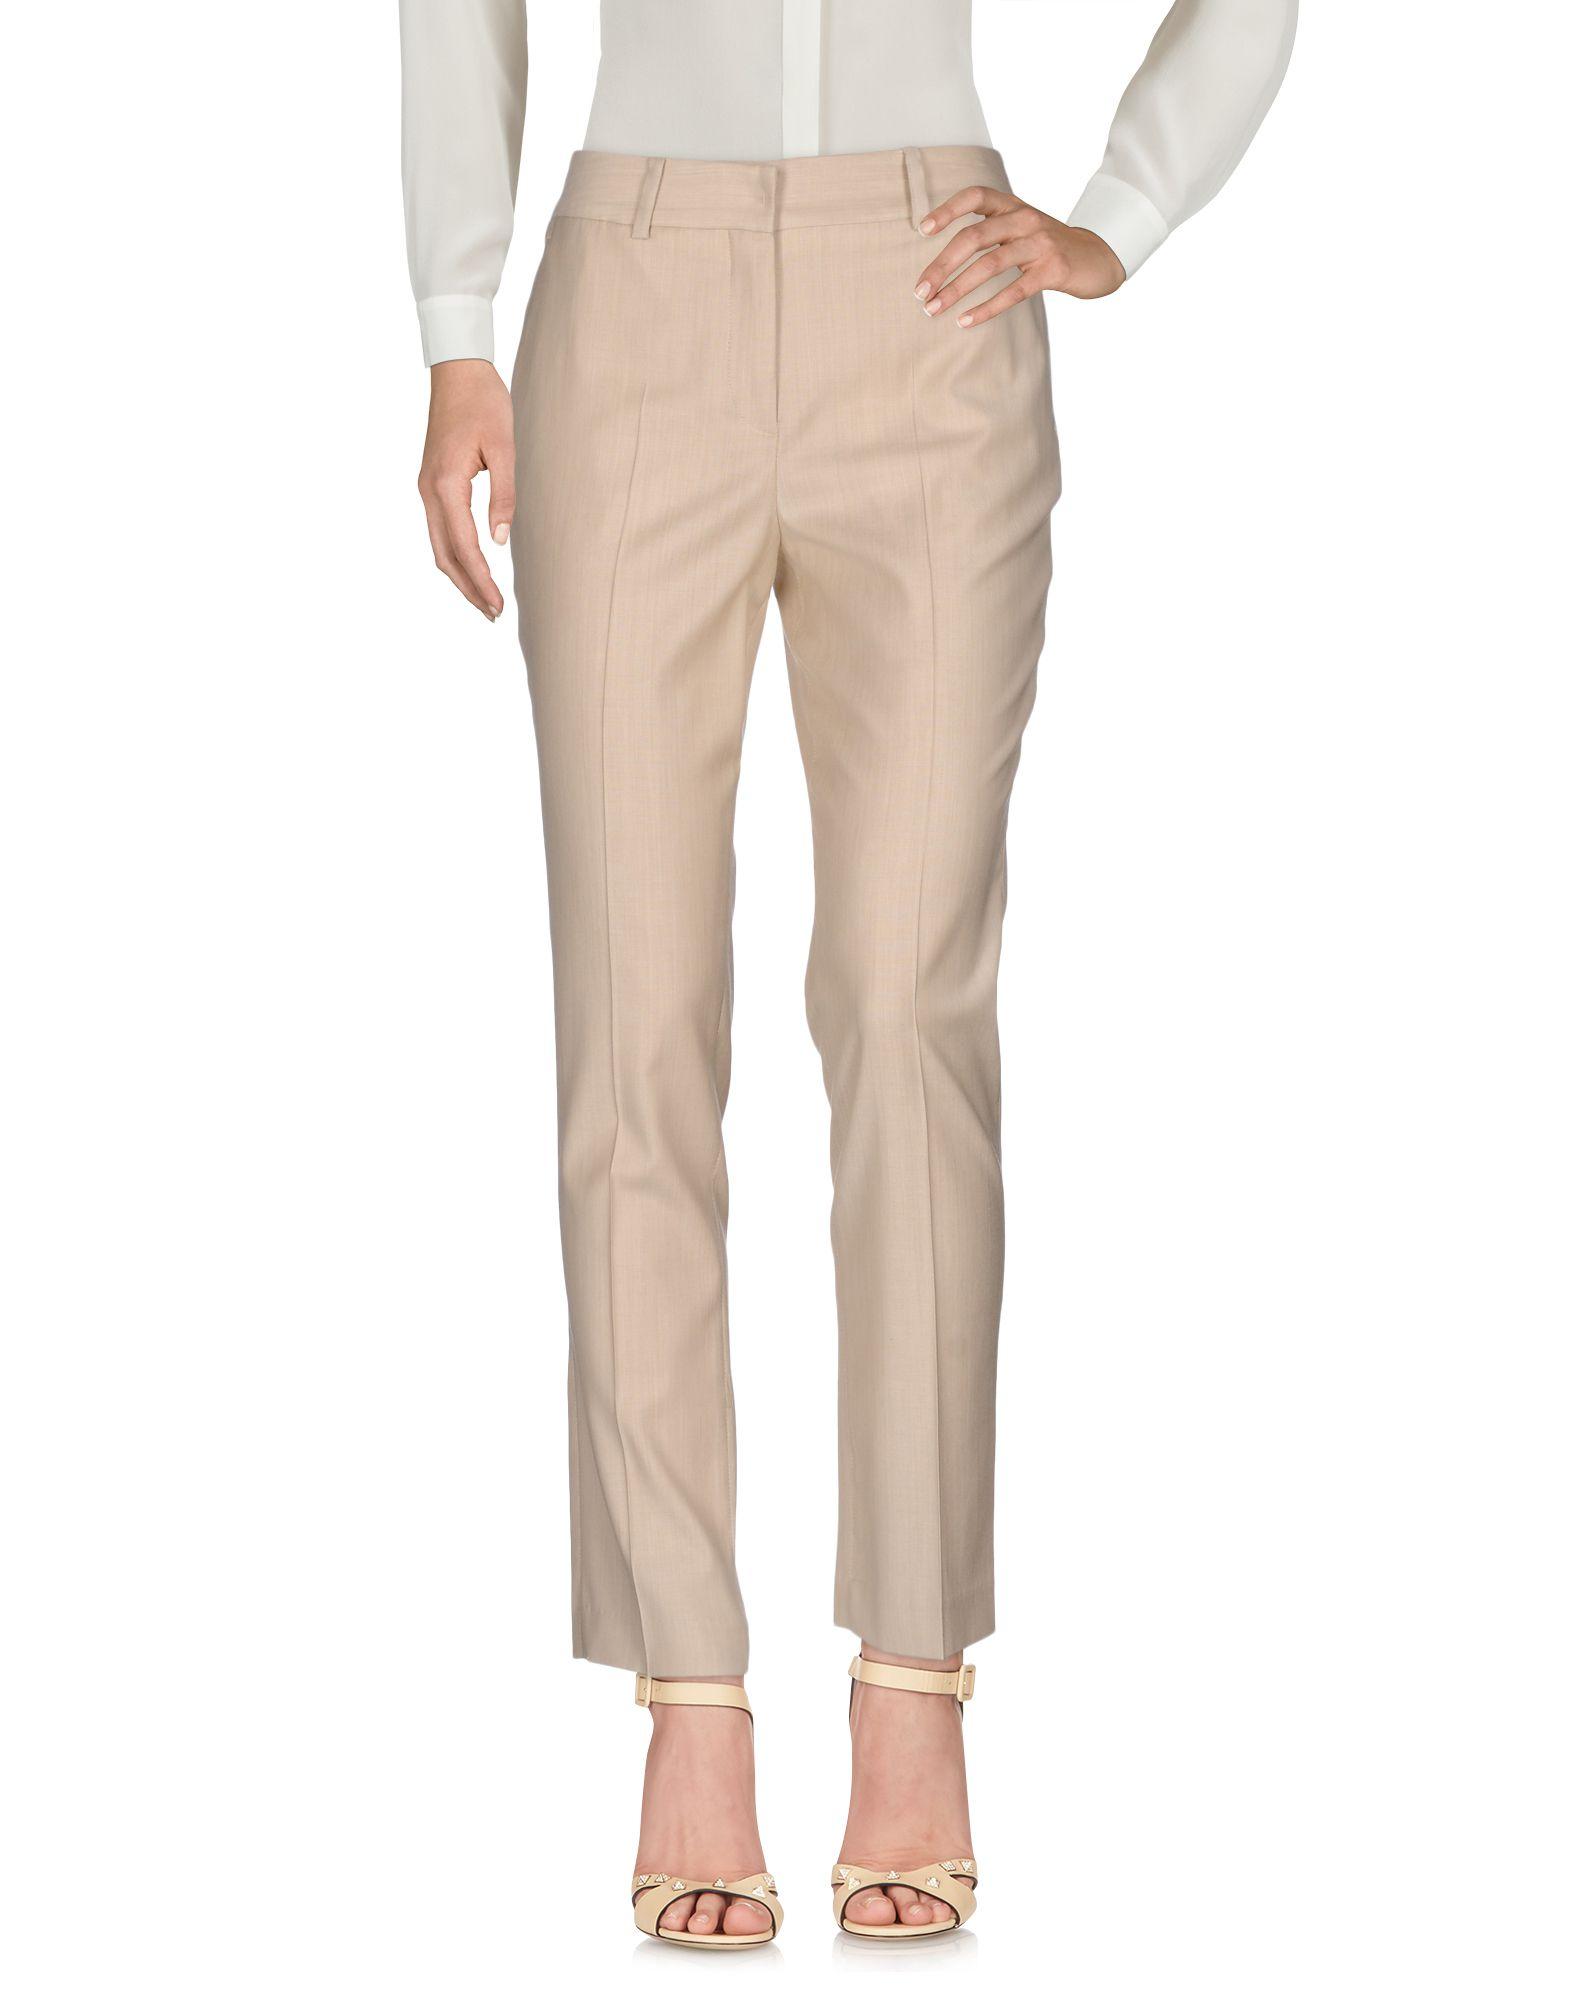 Pantalone Maison Ullens Donna - Acquista online su wapNP